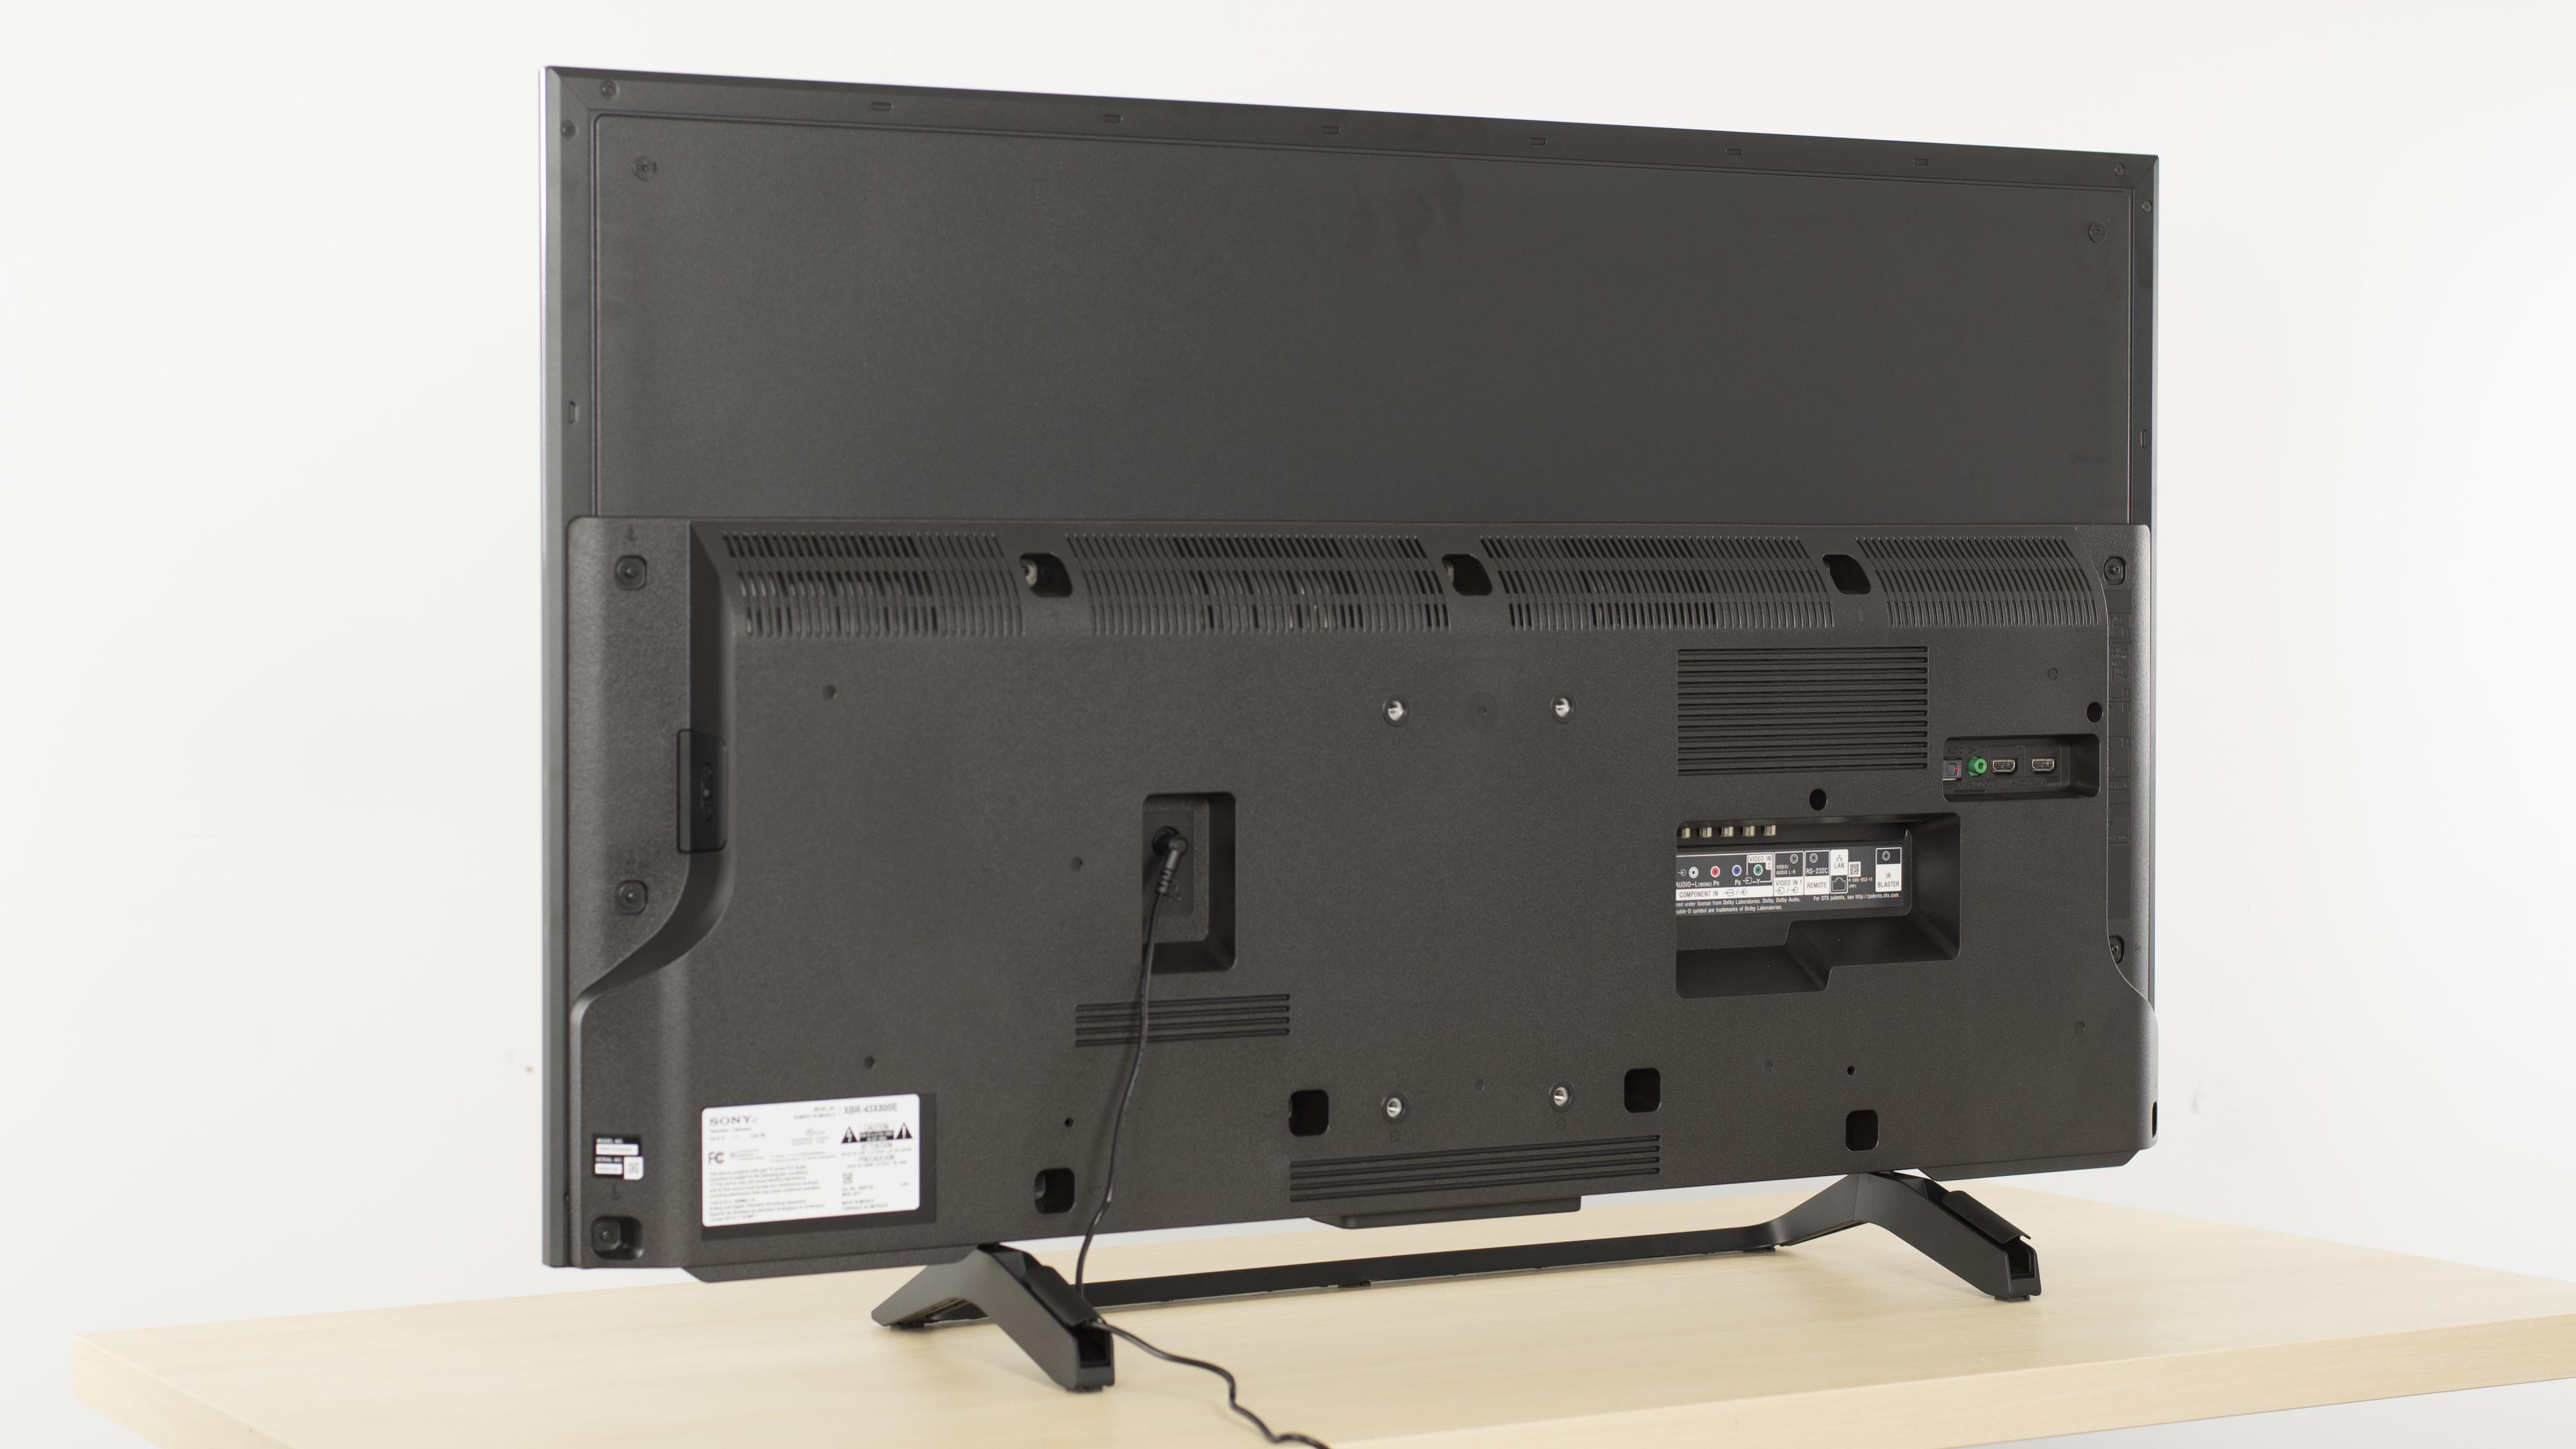 Sony X800e Review Xbr43x800e Xbr49x800e Xbr55x800e